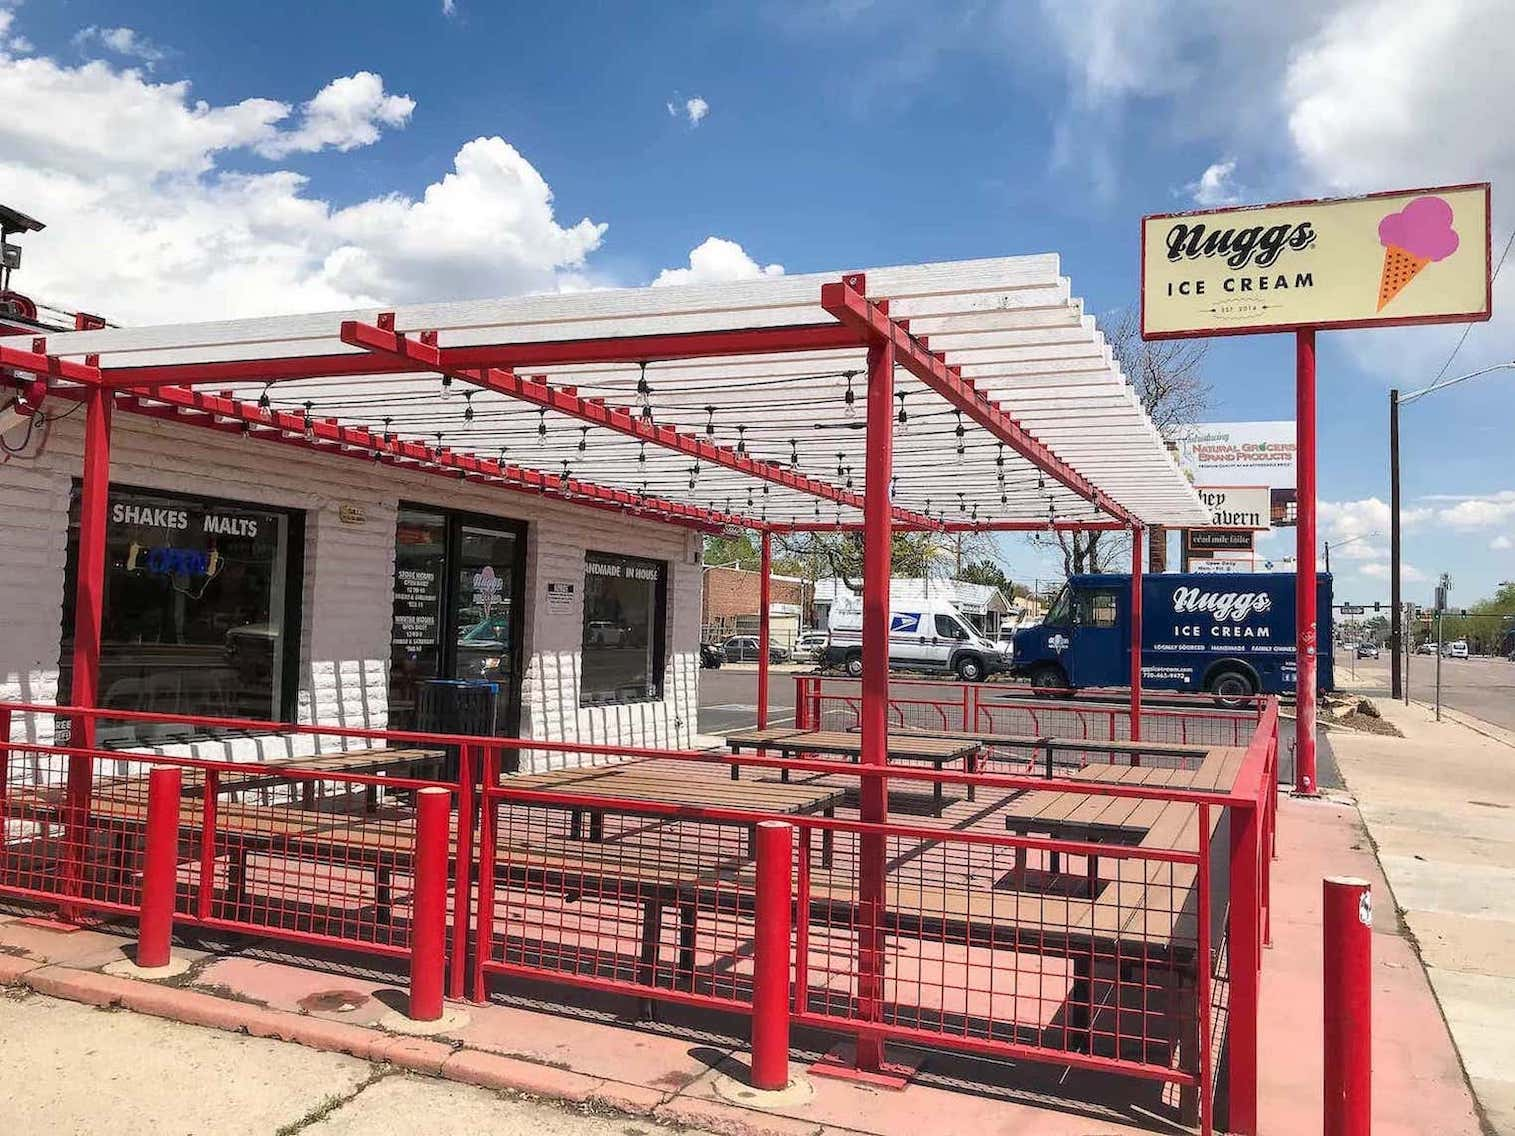 Pergola Railing Posts Outdoor Eating Seating East Denver CO